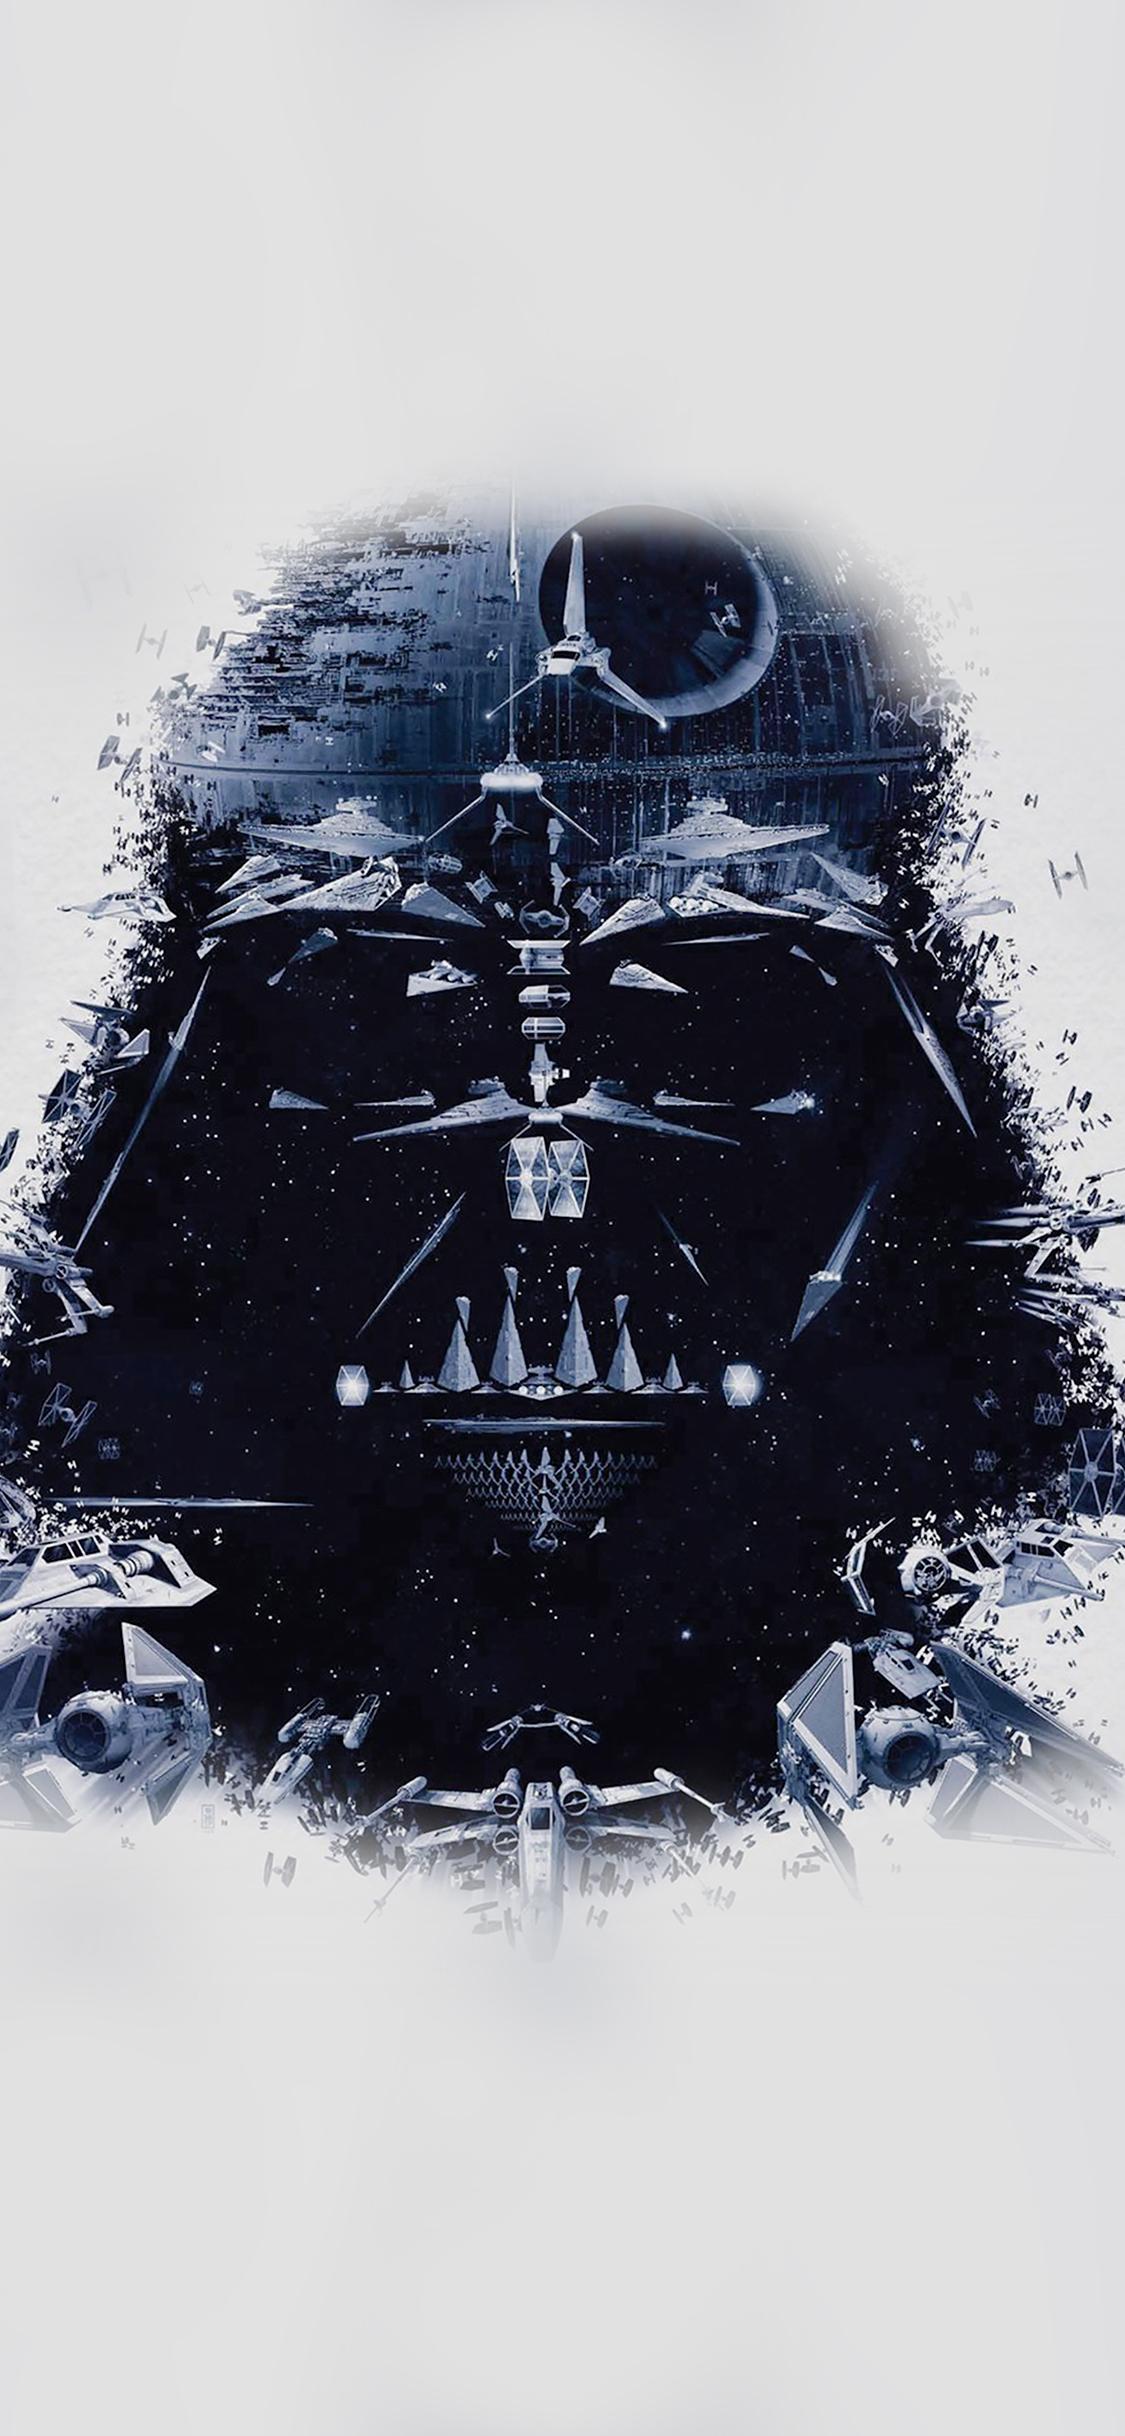 Art Star Wars Iphone X Wallpapers Free Download